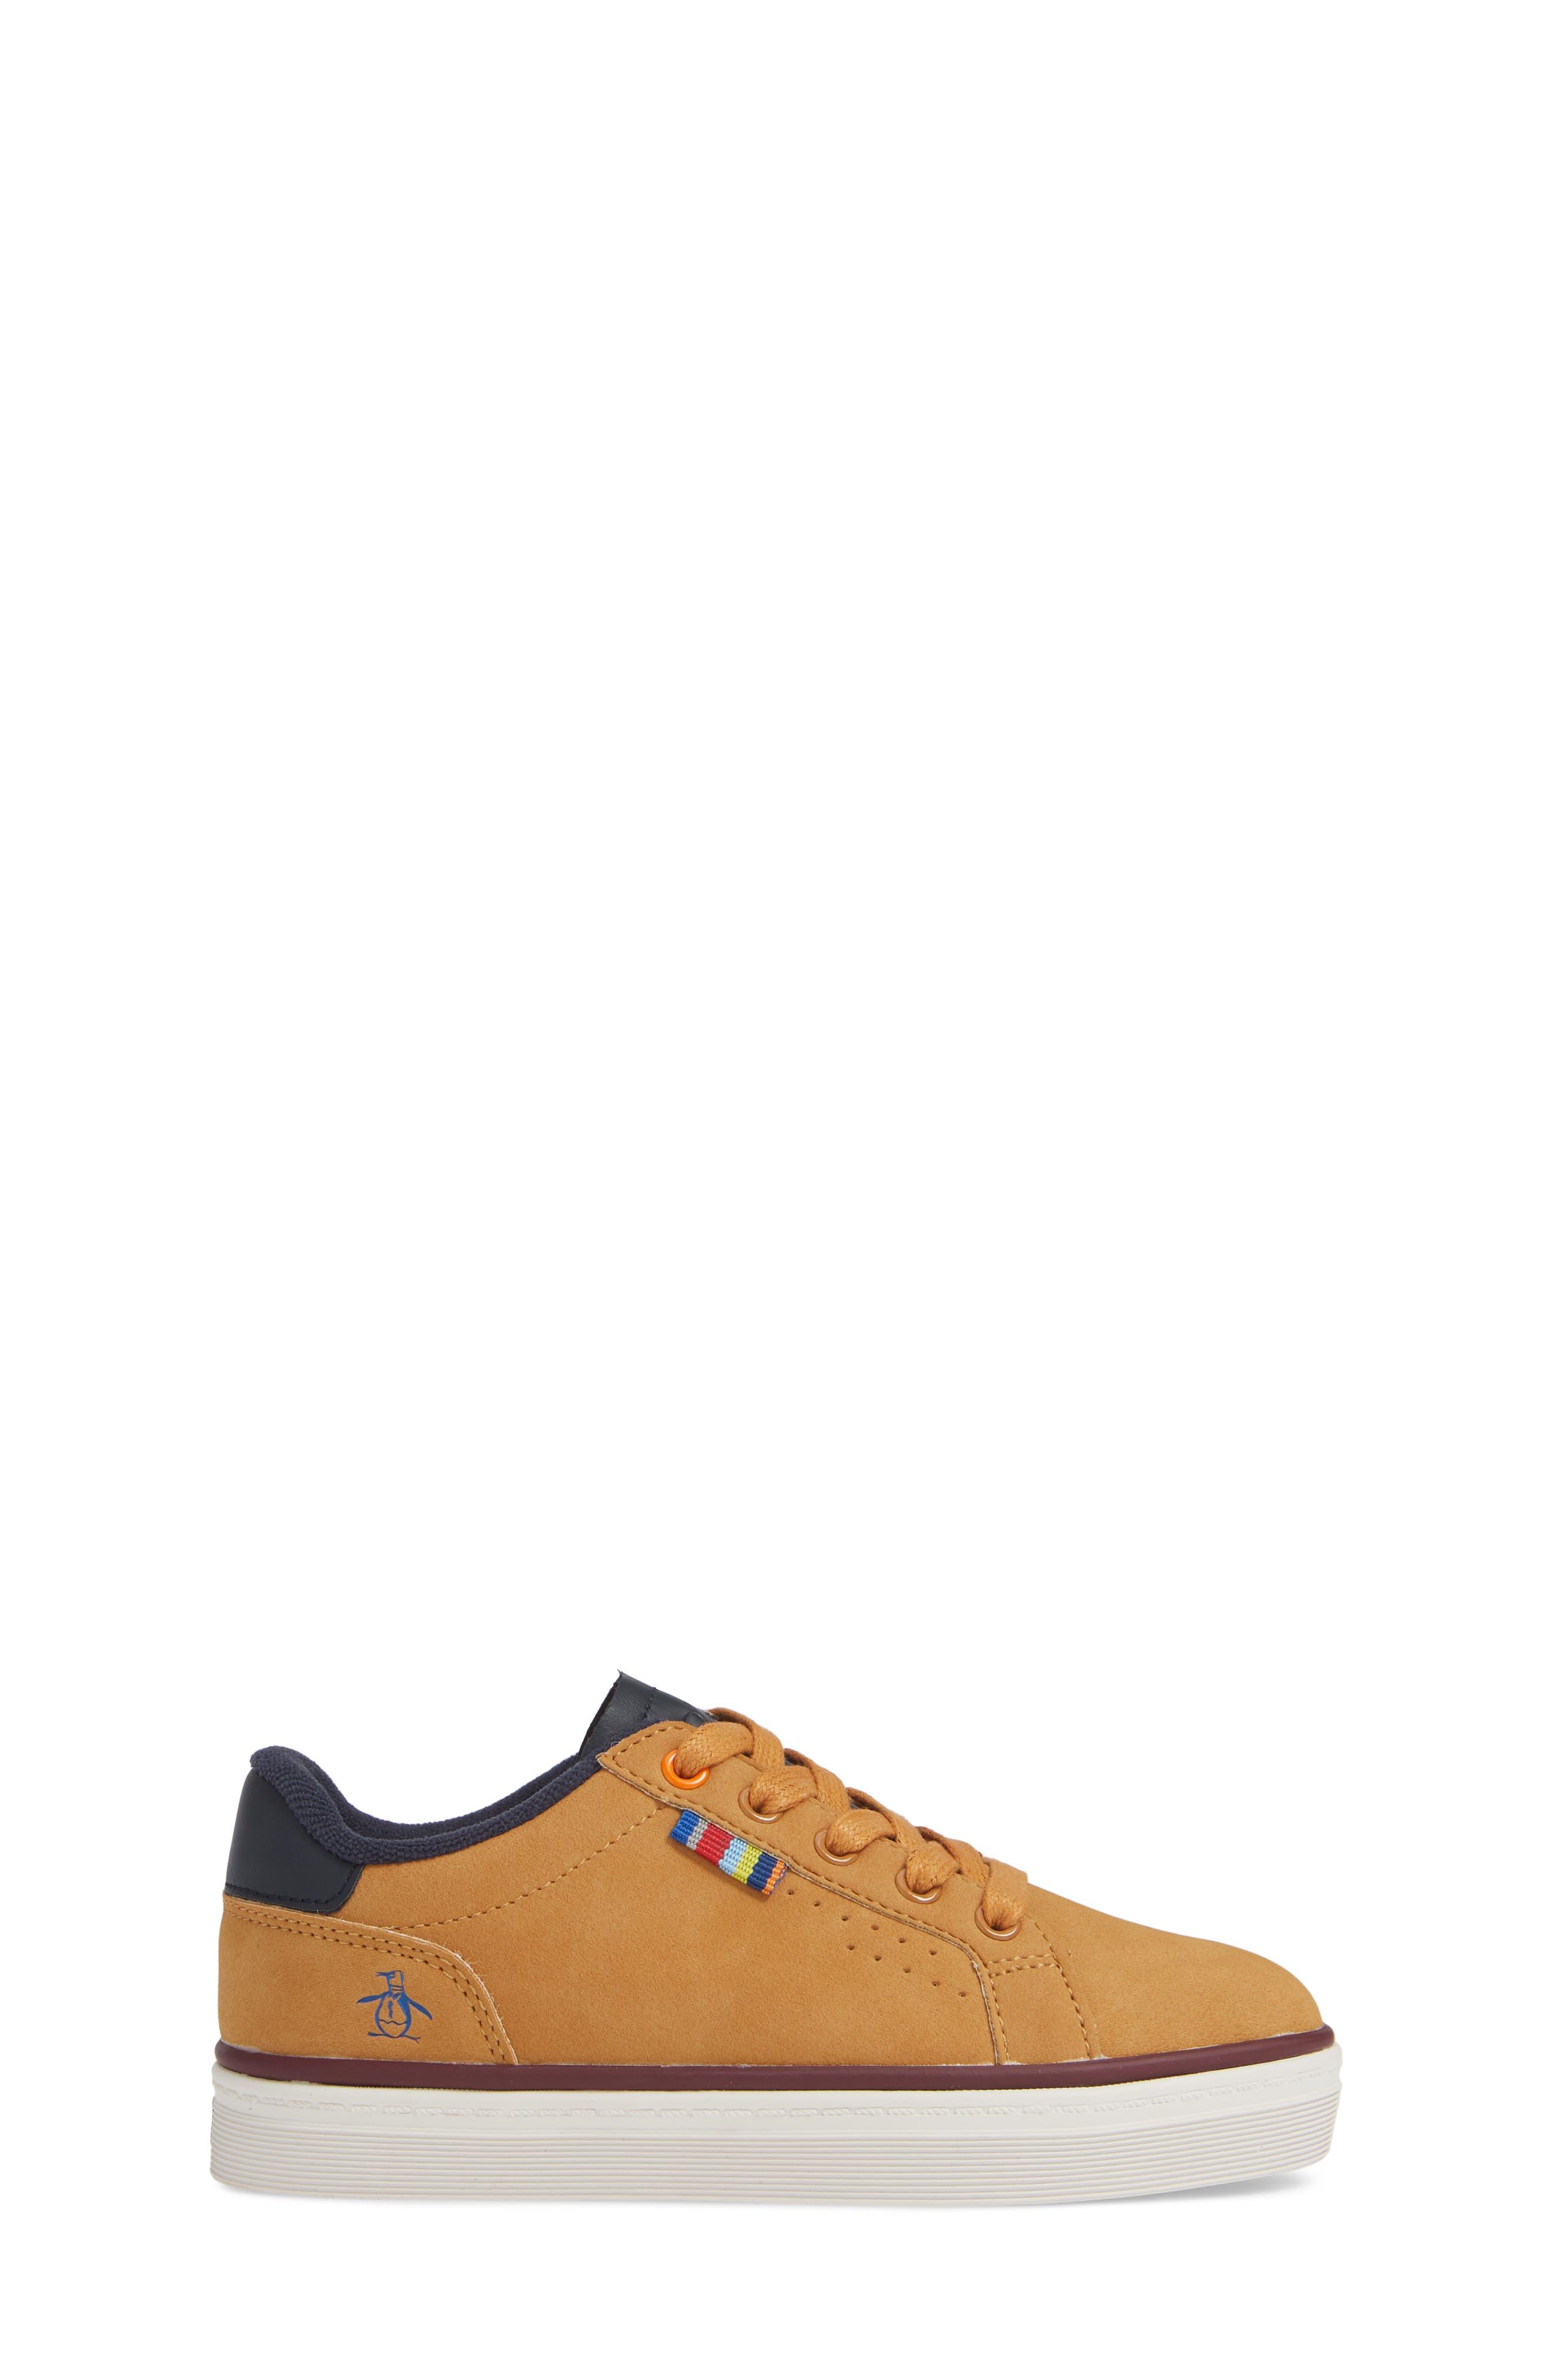 ORIGINAL PENGUIN,                             Dexter Sneaker,                             Alternate thumbnail 3, color,                             WHEAT/ NAVY